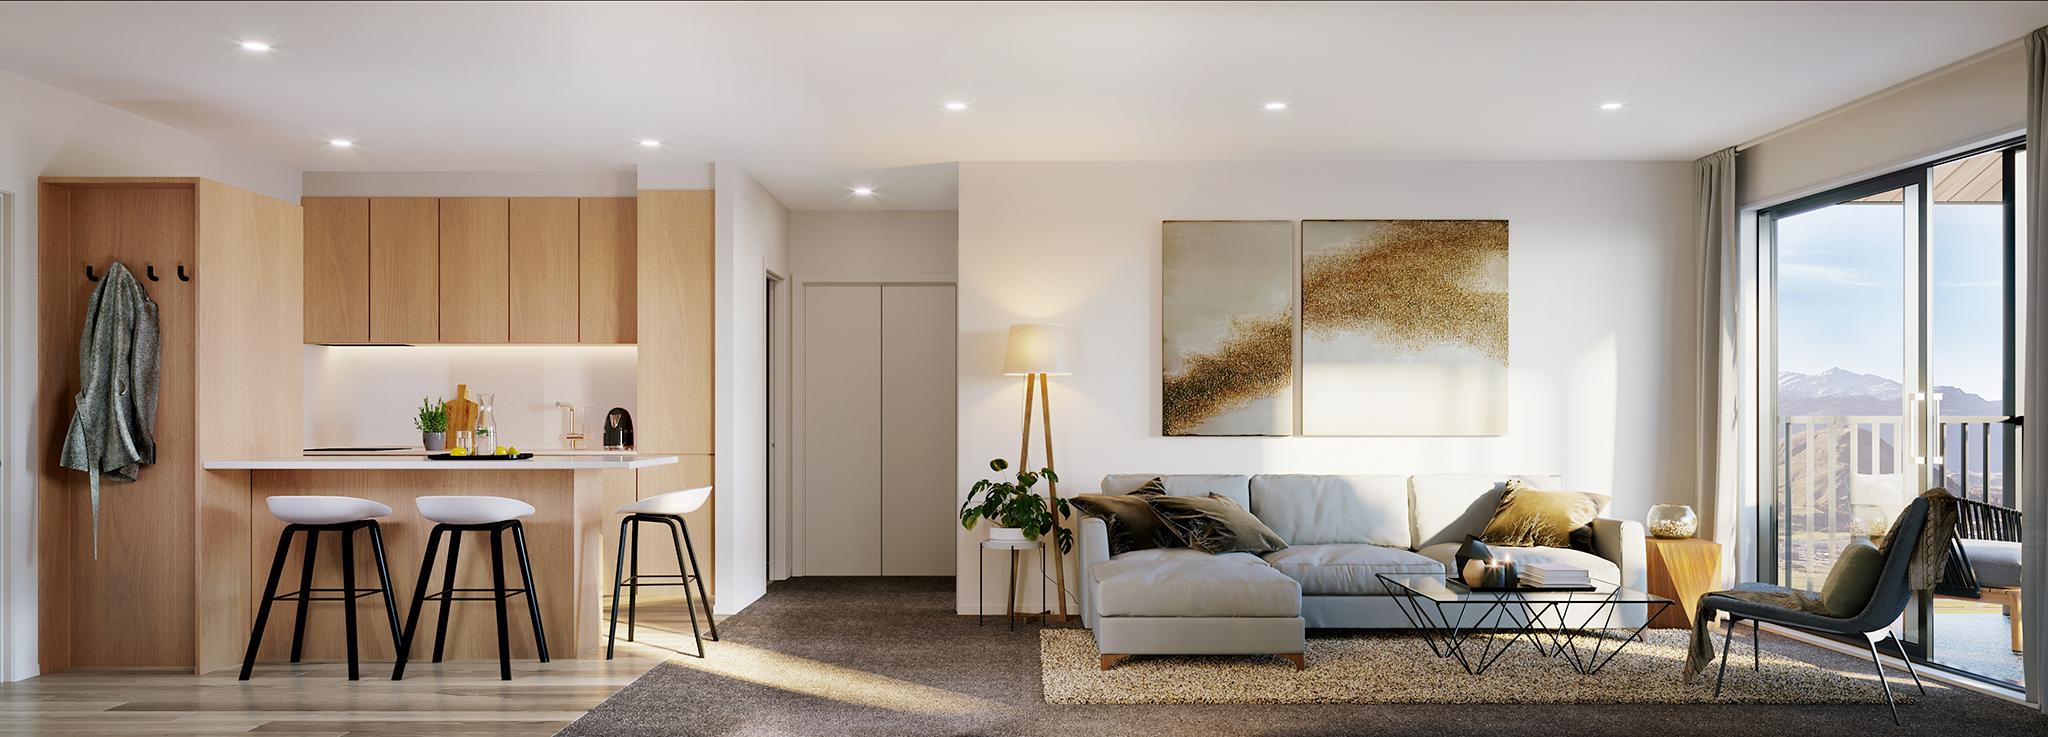 Remarkables Park Apartments_Int_F1_LivingA_Final01.jpg